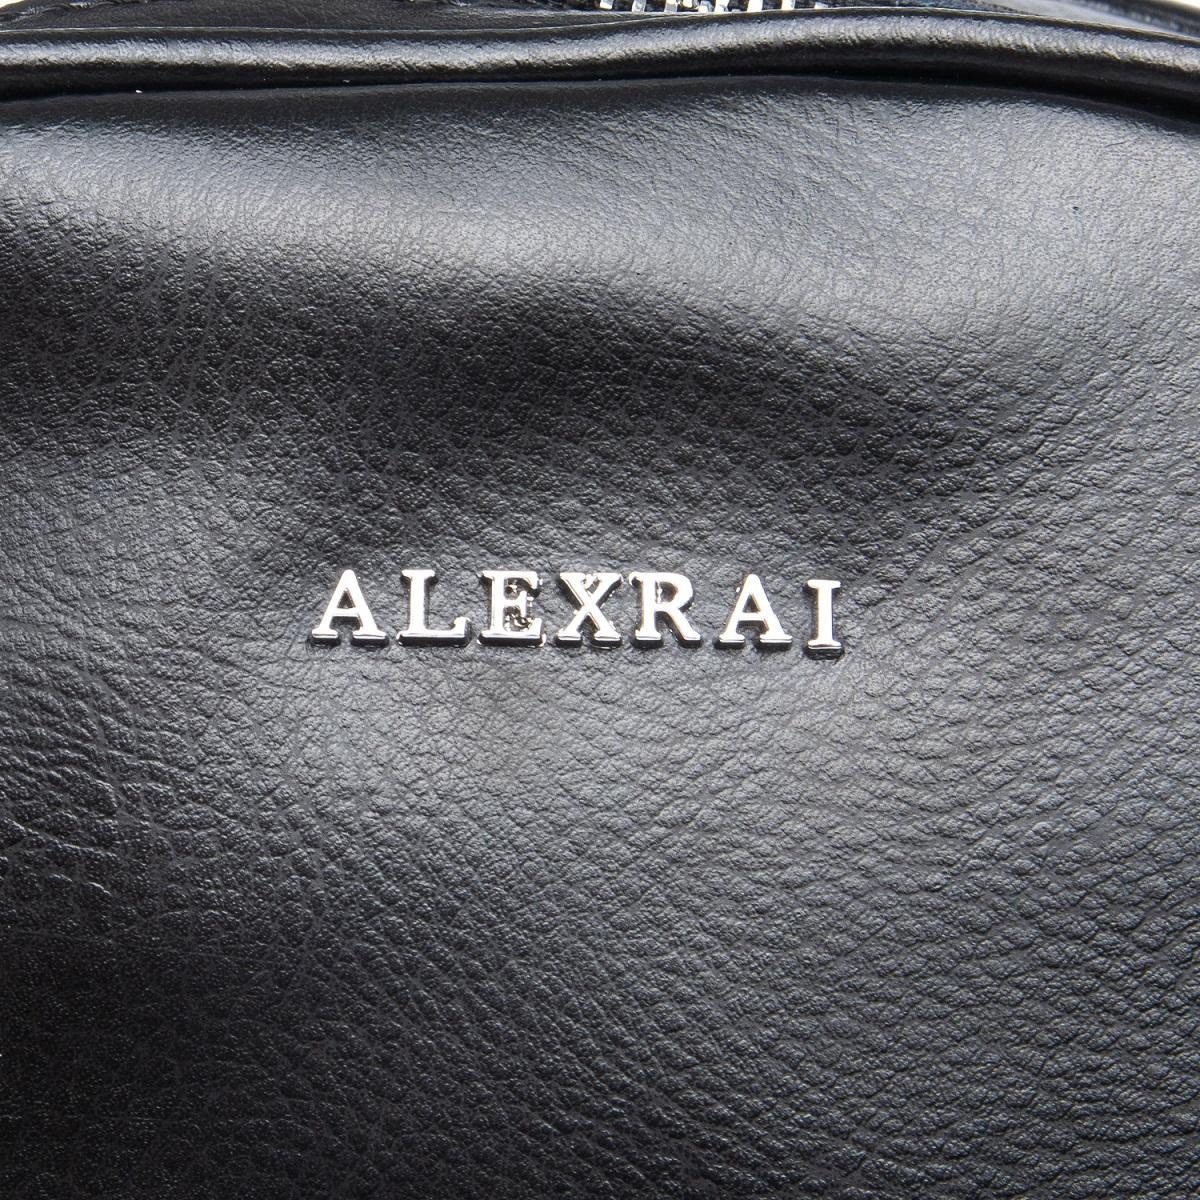 Сумка Женская Рюкзак кожа ALEX RAI 08-2 8695-2 black - фото 5